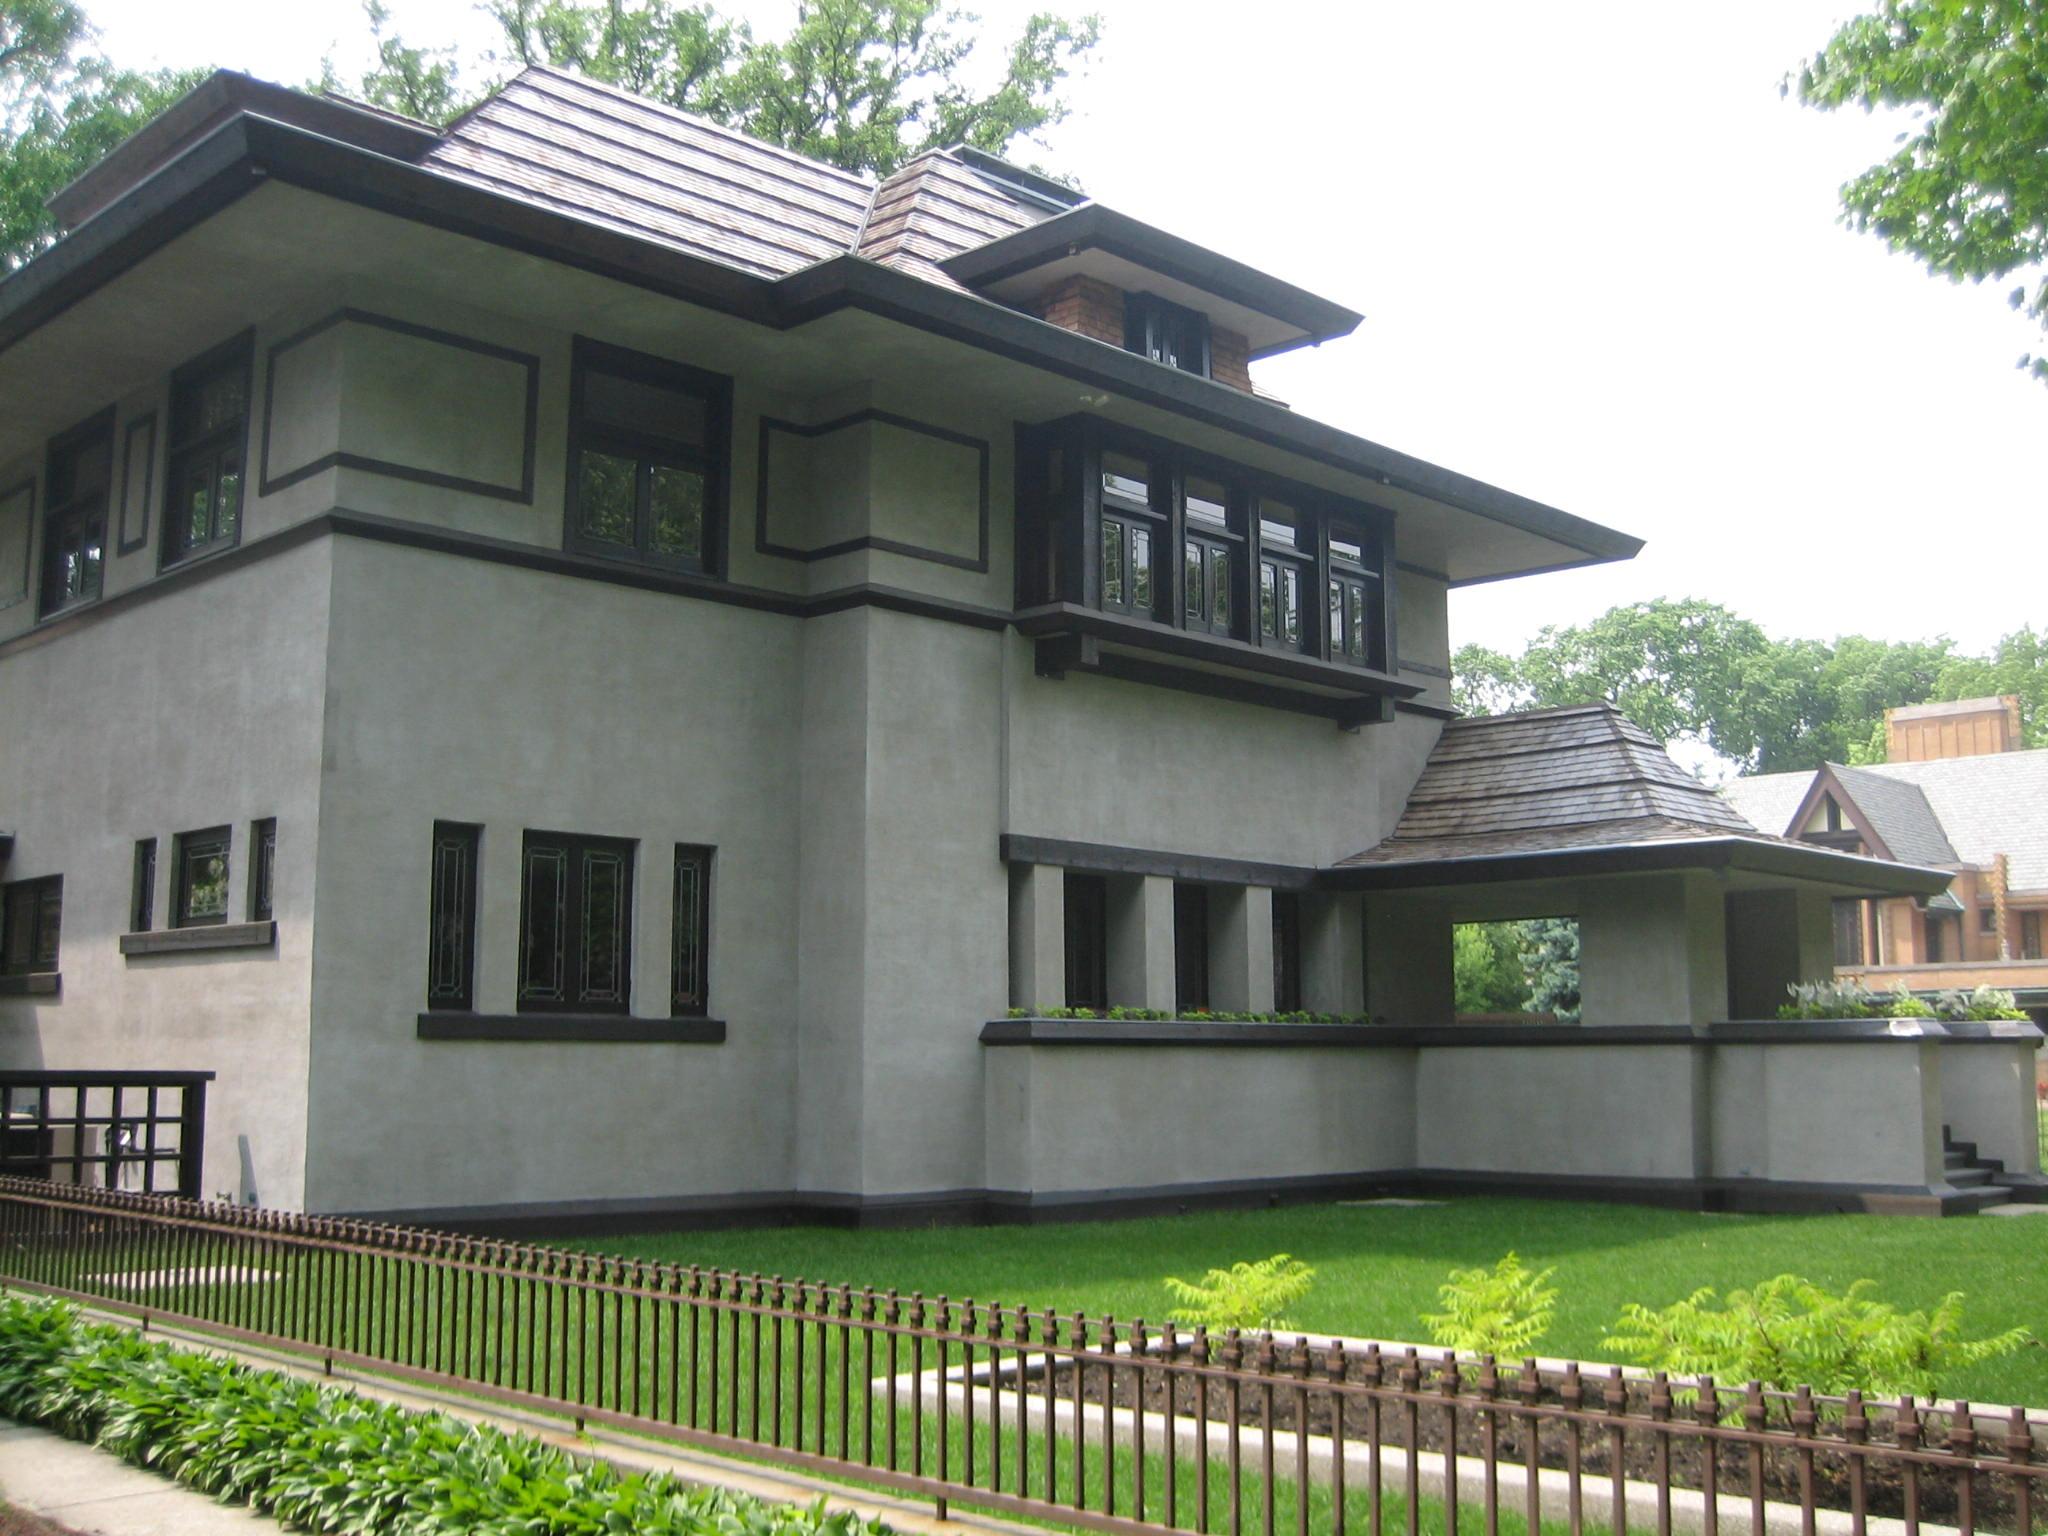 File:Oak Park Il Hills House5.jpg - Wikipedia, the free encyclopedia